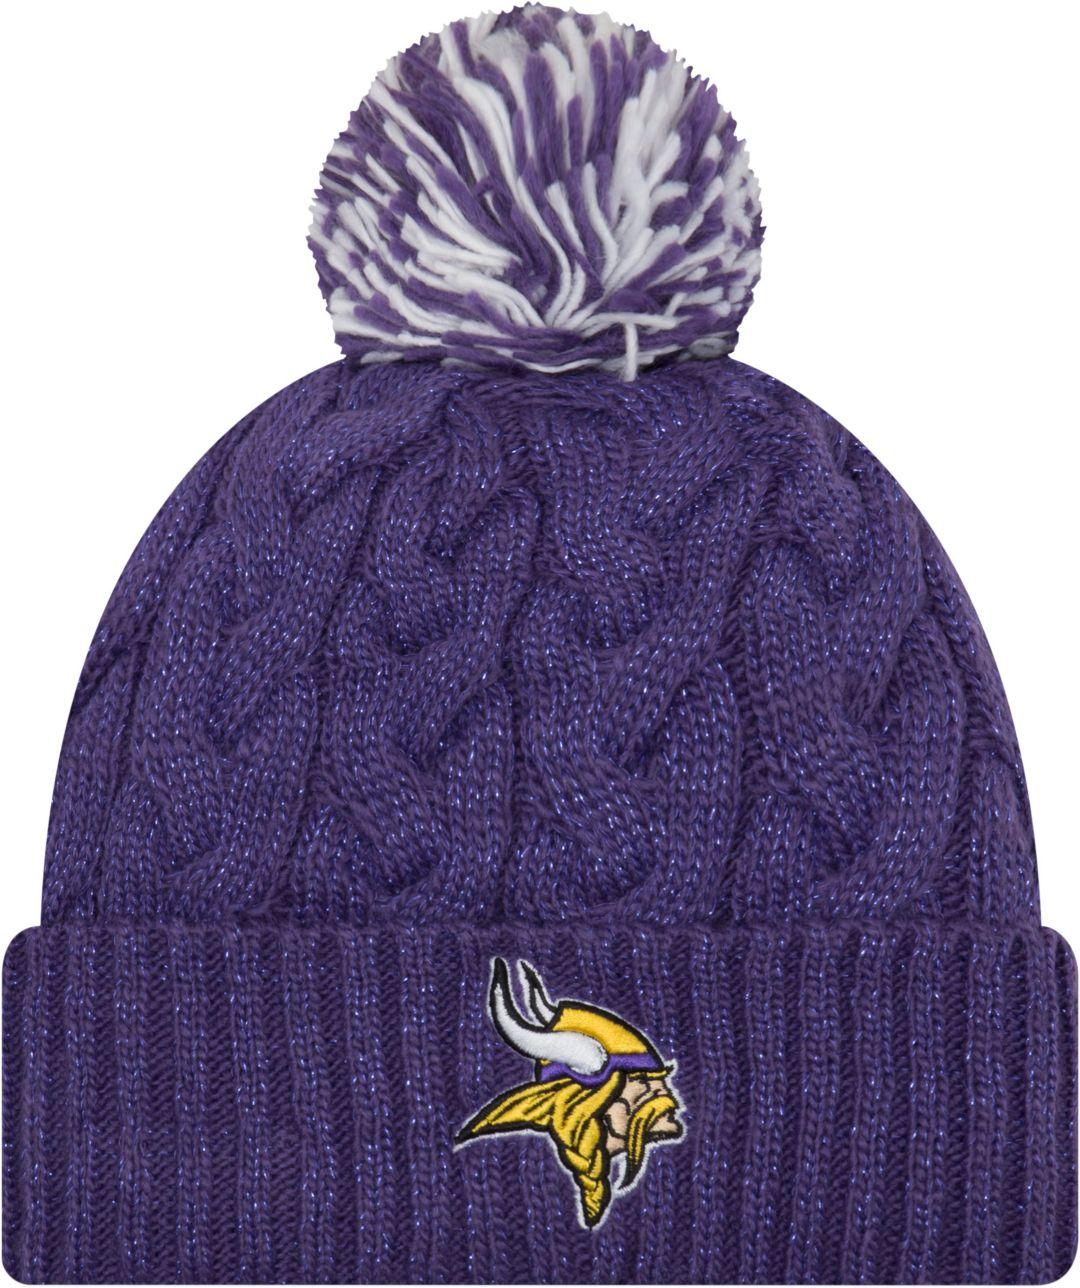 7135463cd New Era Women's Minnesota Vikings Cozy Cable Purple Pom Knit